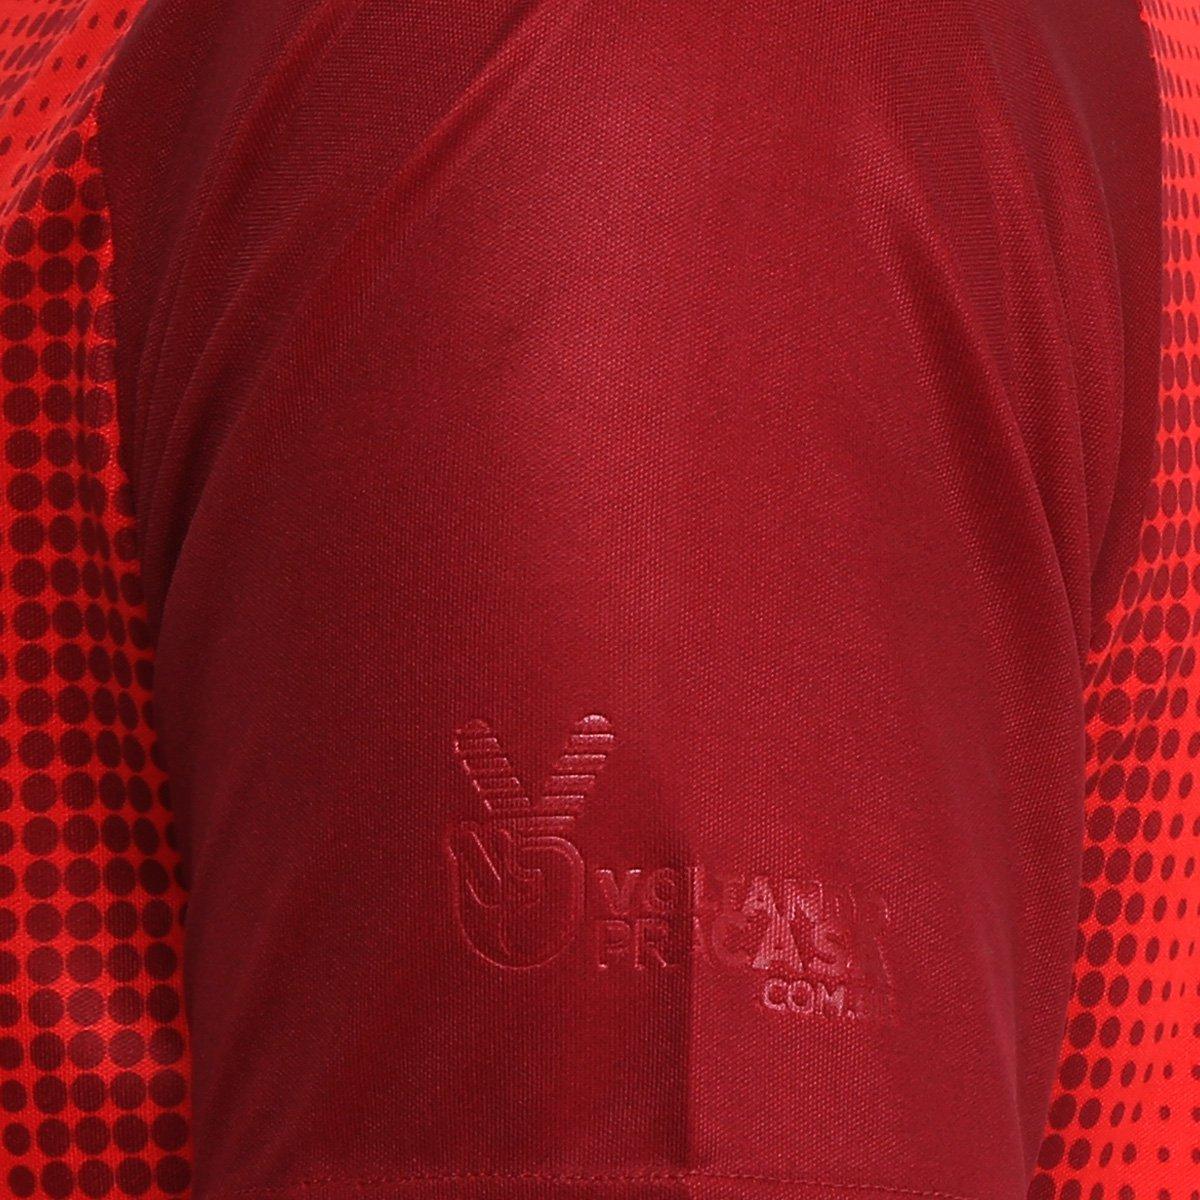 ... Camisa Náutico III 2018 s n° Aflitos - Torcedor Topper Masculina ... f90e031b560cc